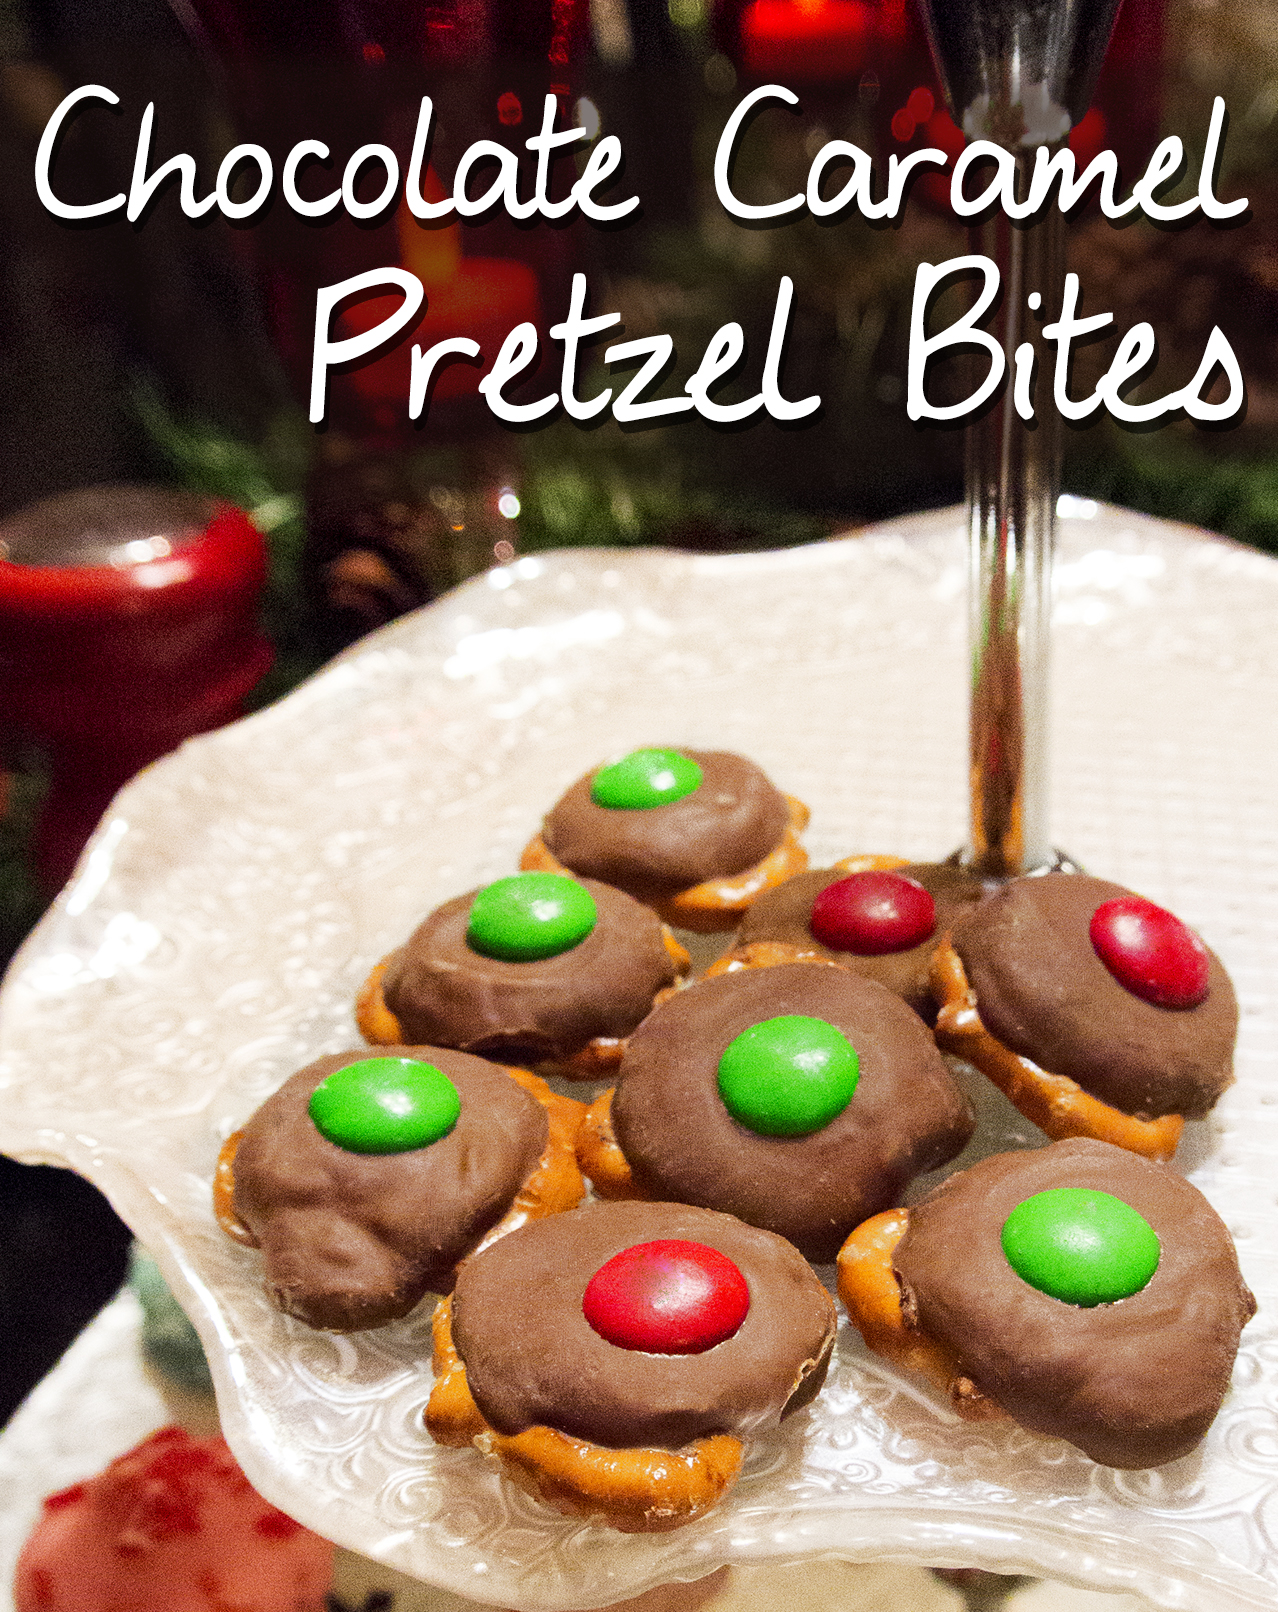 Chocolate Caramel Pretzel Bites